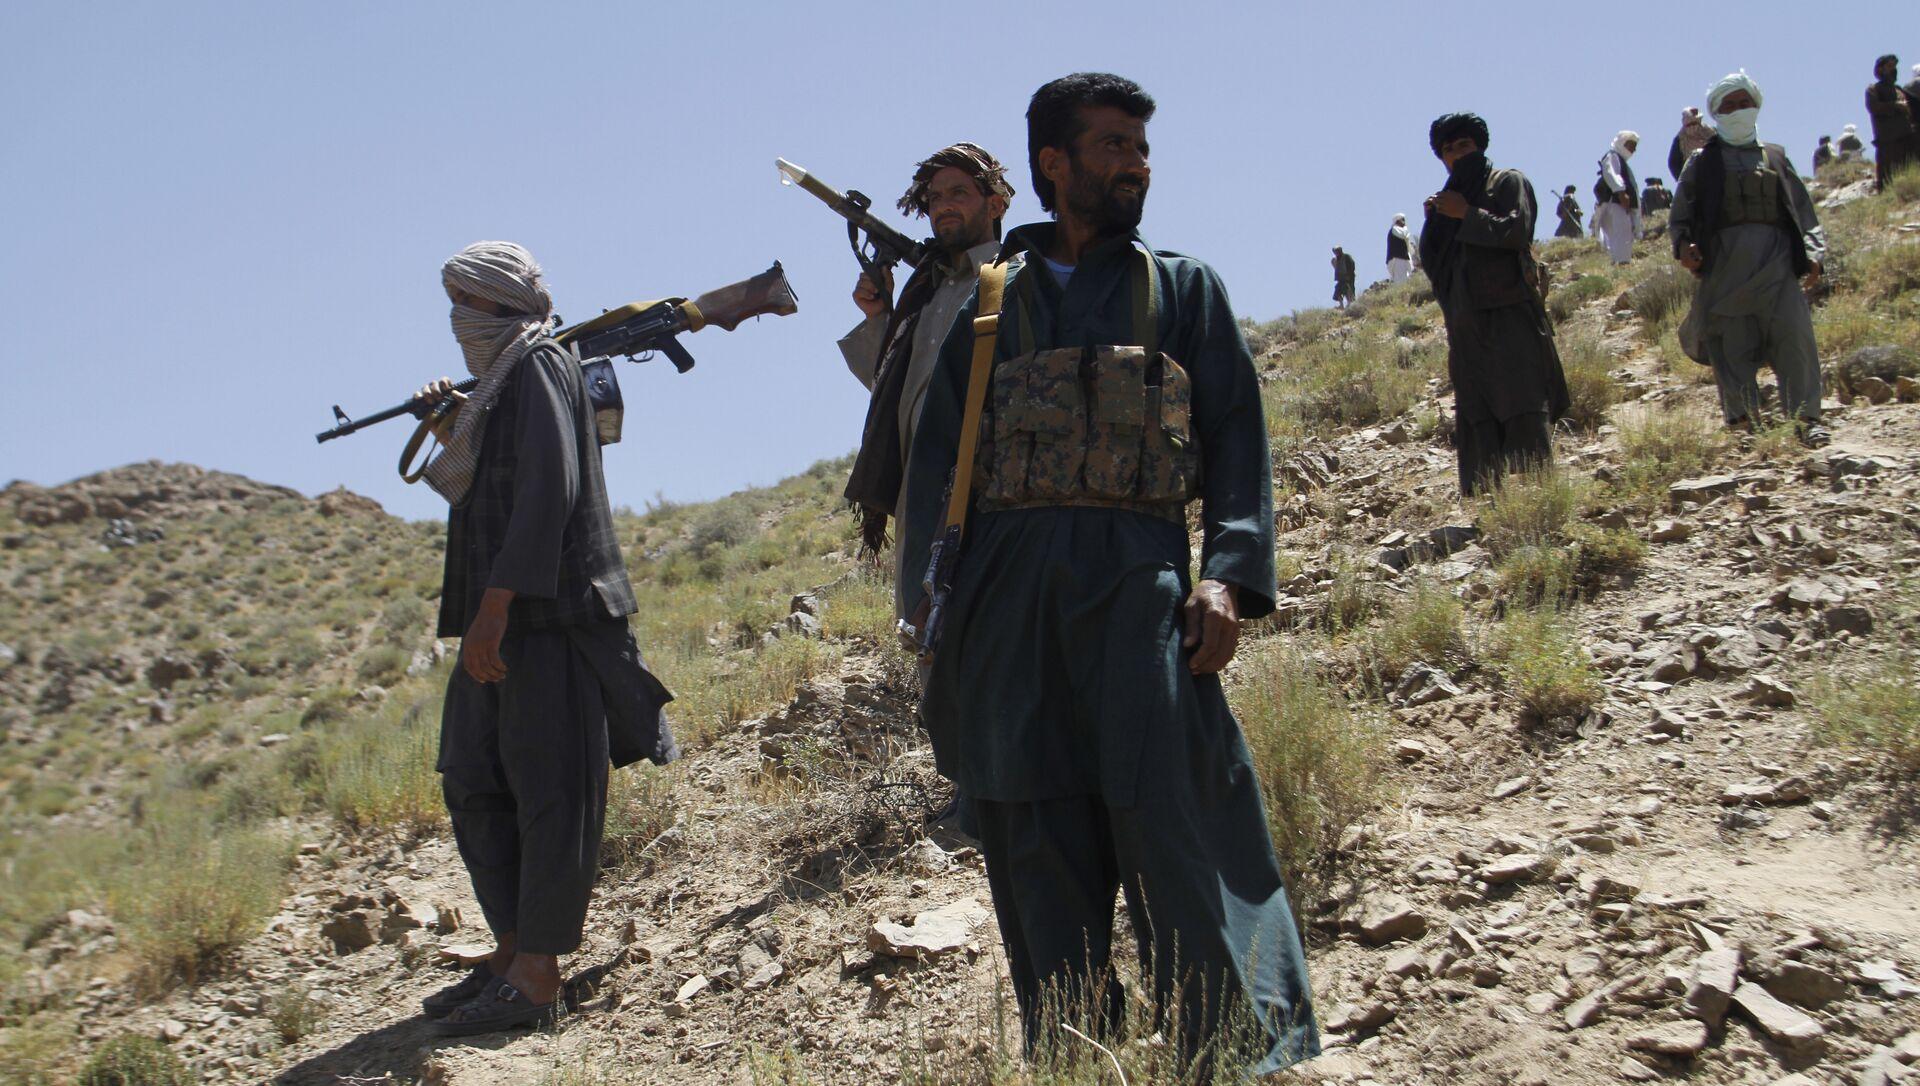 Taliban fighters. (File) - Sputnik International, 1920, 11.08.2021